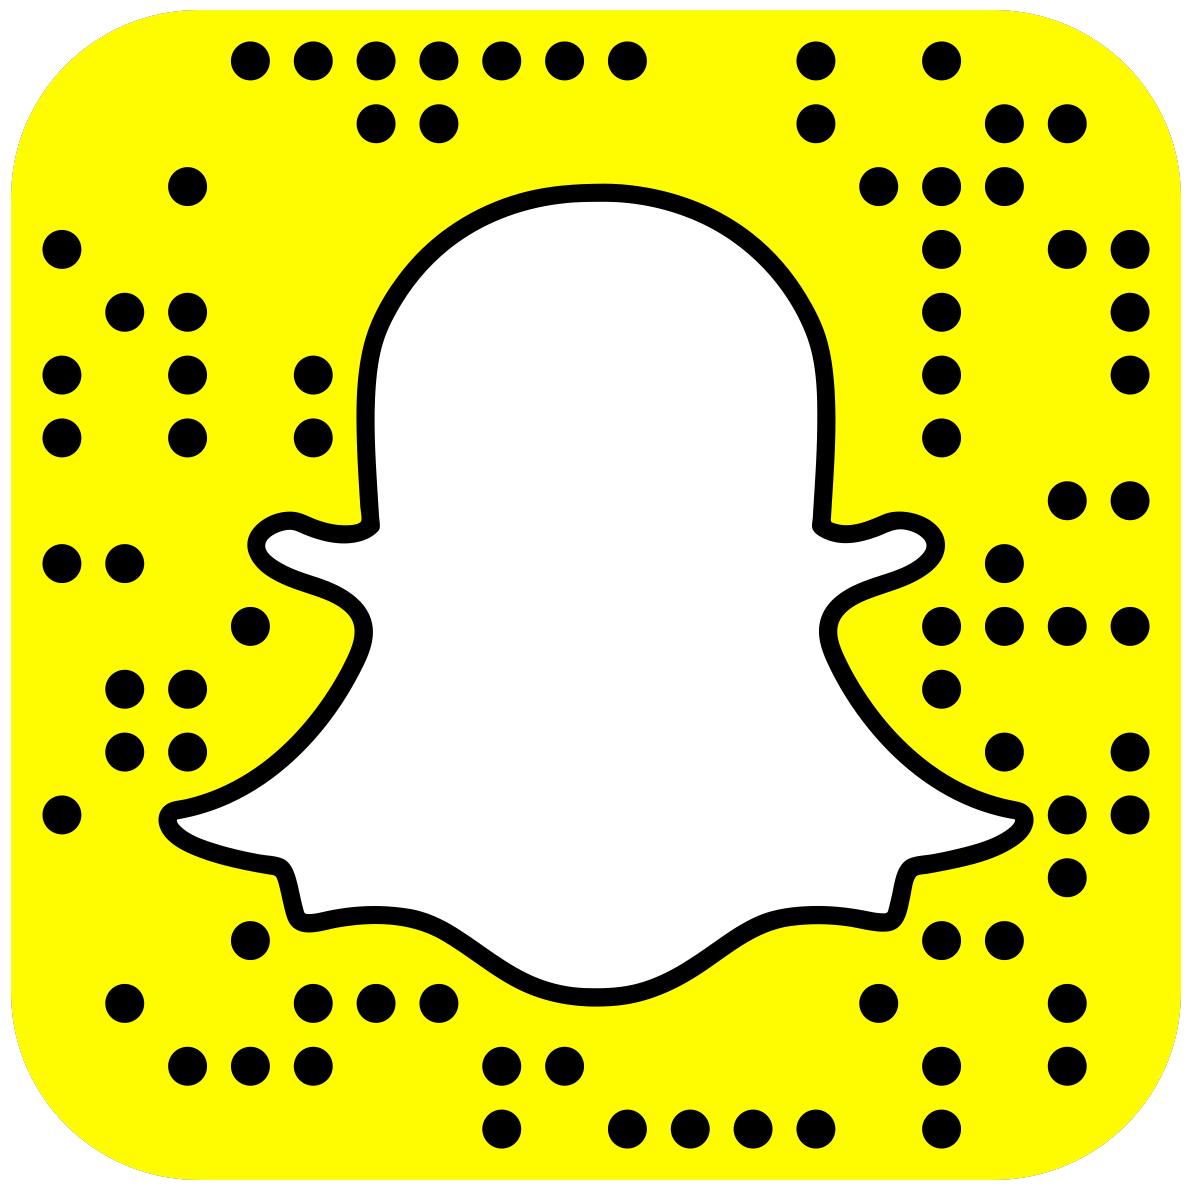 Biance Gonzalez Snapchat username